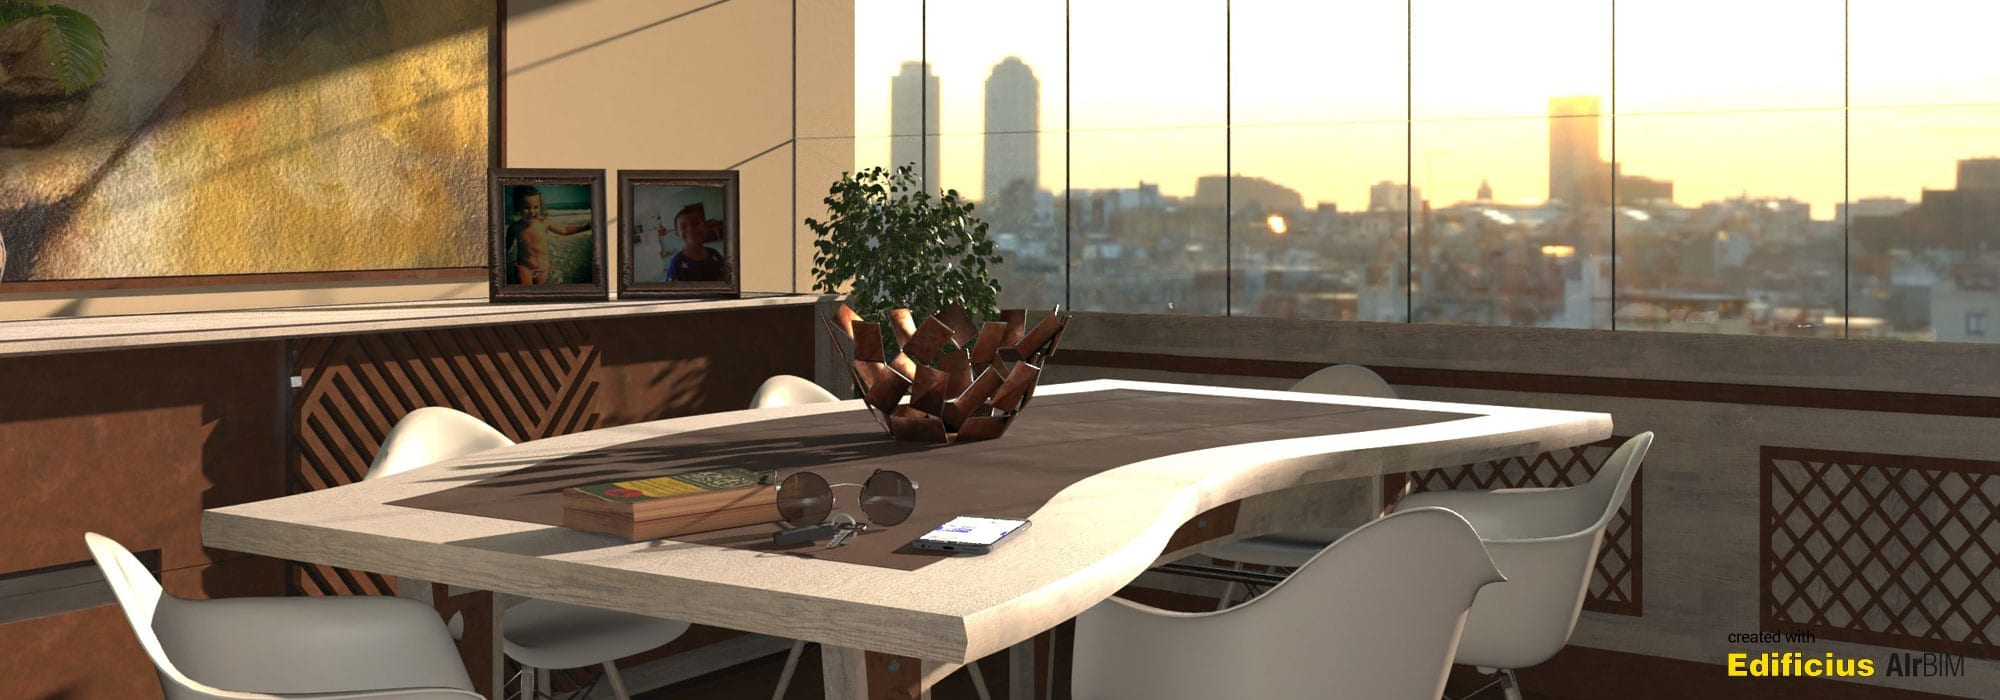 Renderizações foto realistas de arquitetura 5 | Edificius+AIrBIM | ACCA software